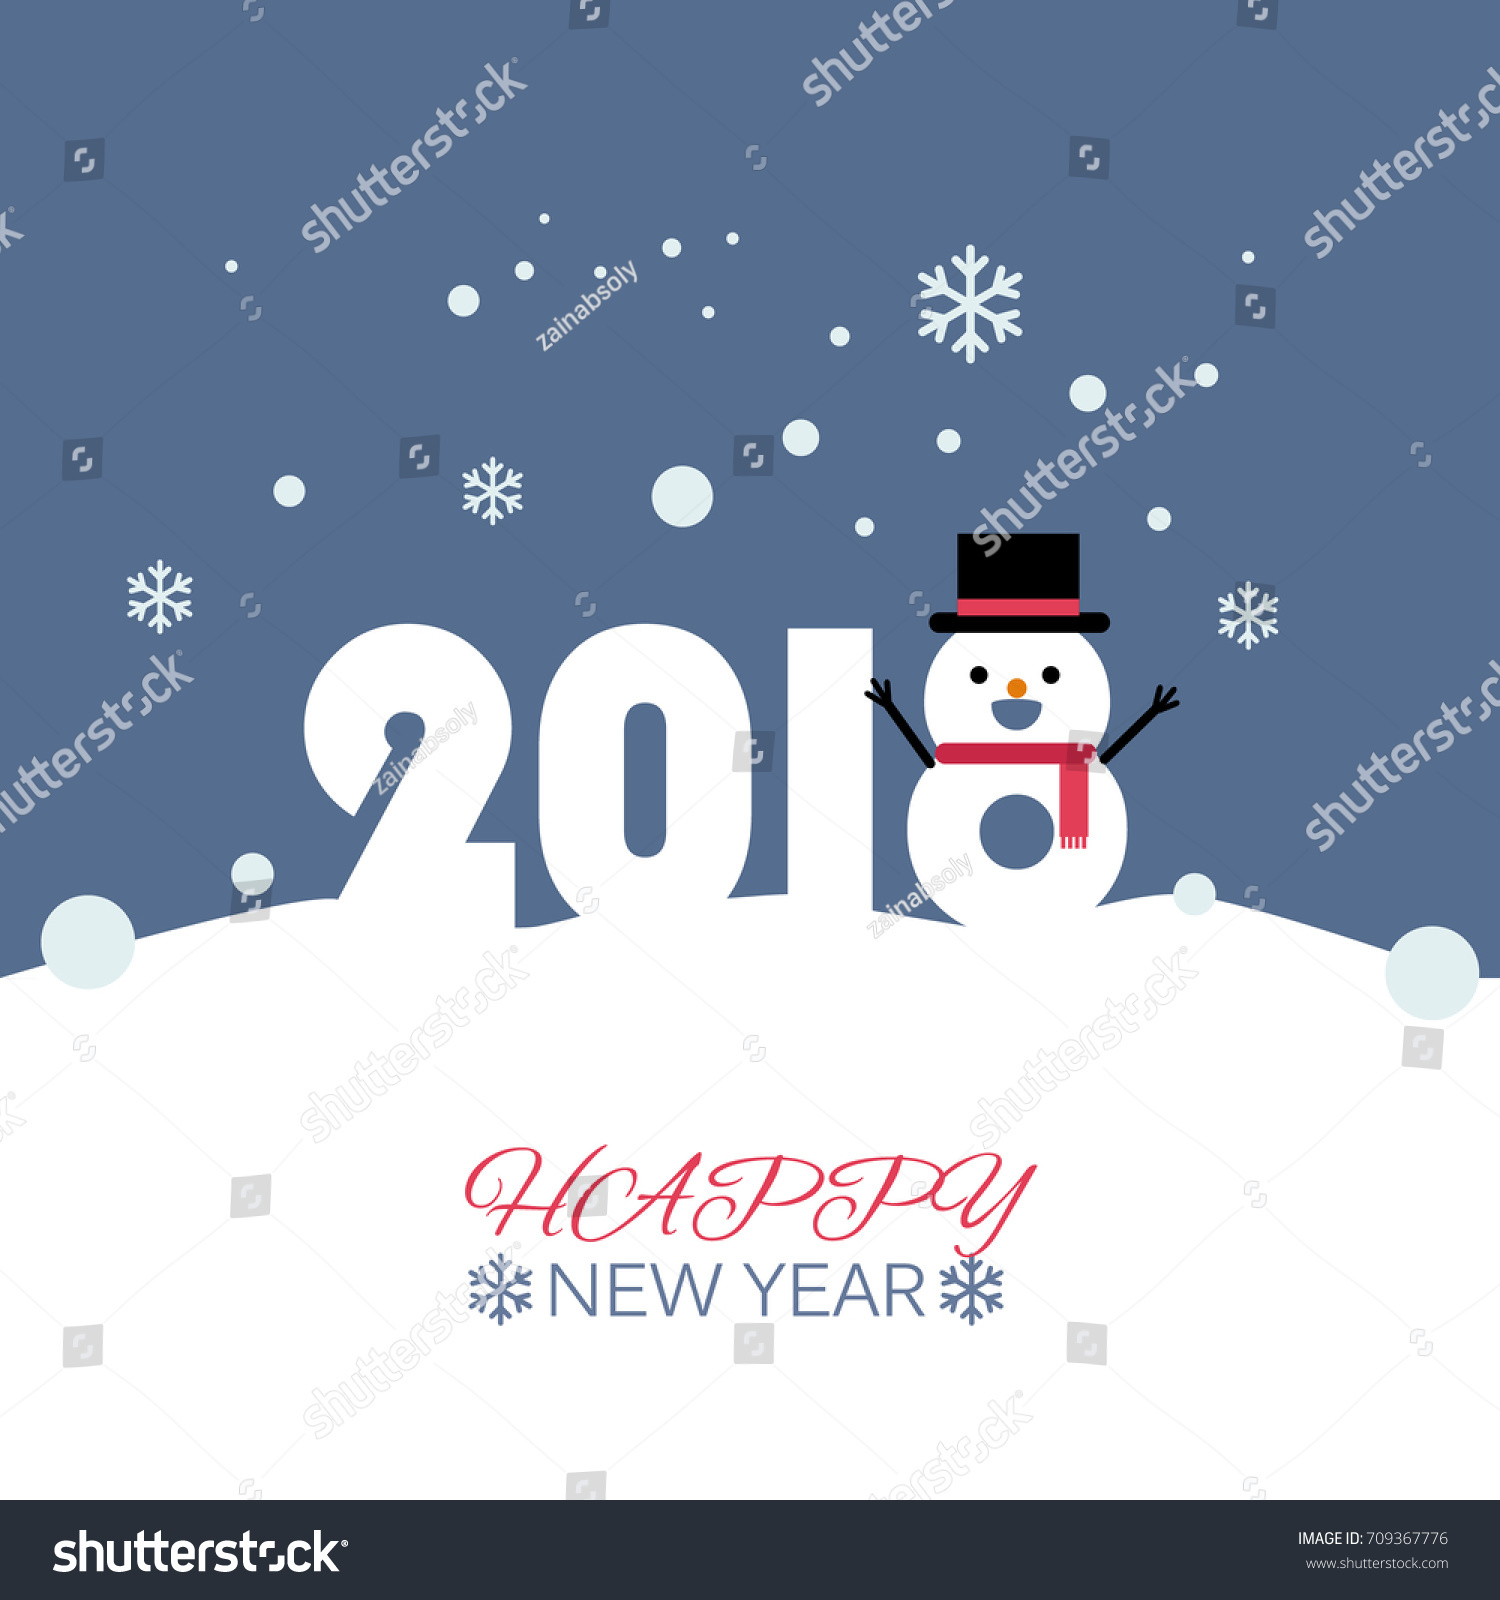 Happy New Year Snow Man Vector Stock Vector (Royalty Free) 709367776 ...